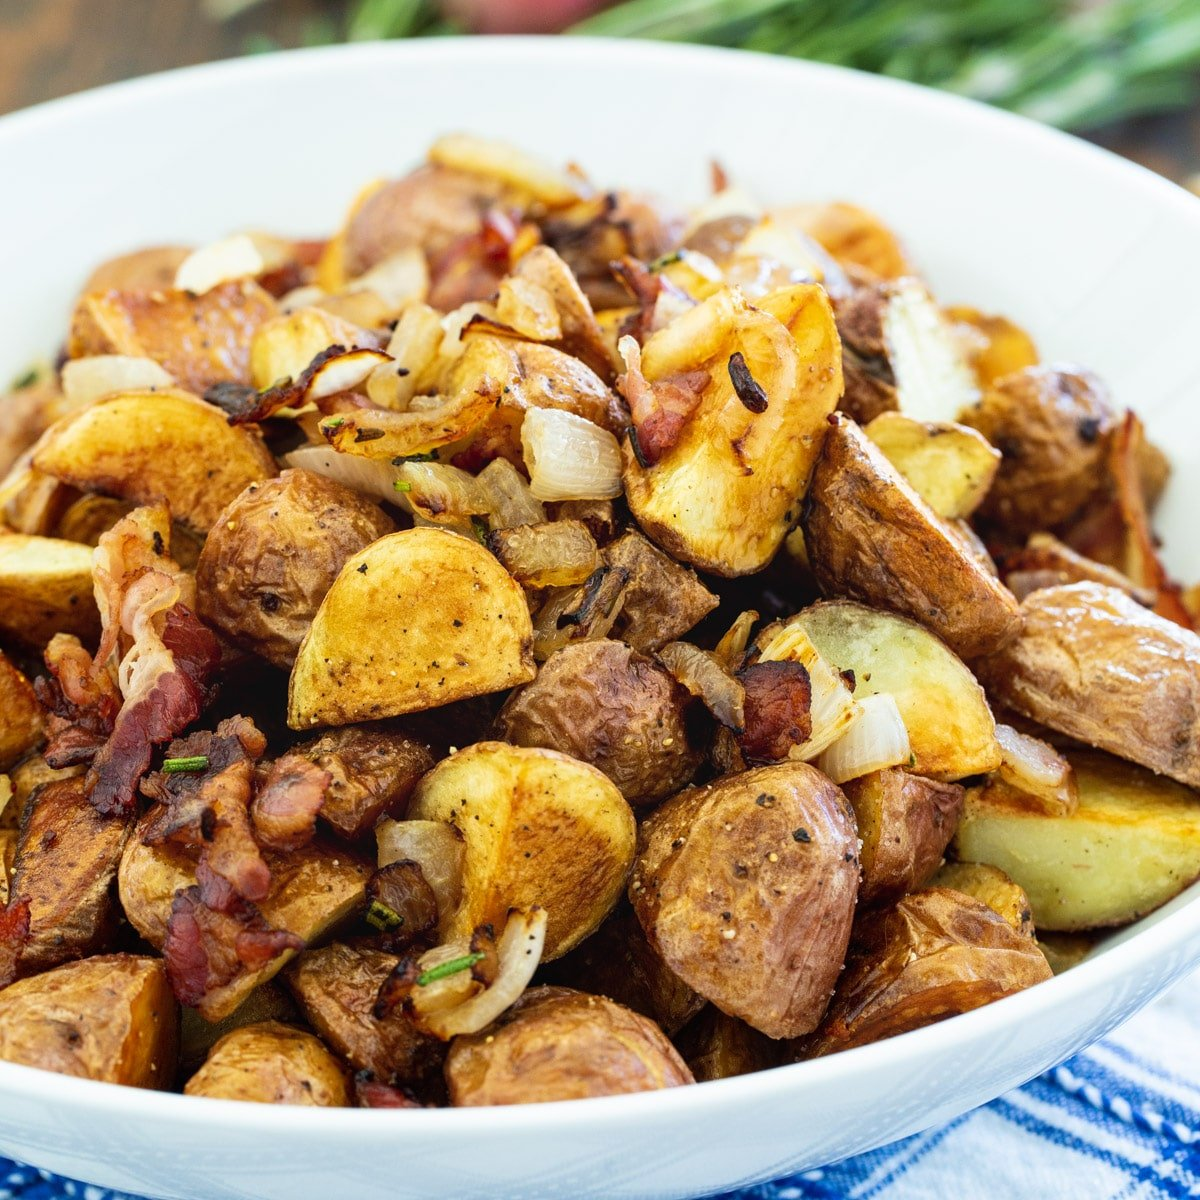 Italian Roasted Potatoes in a bowl.